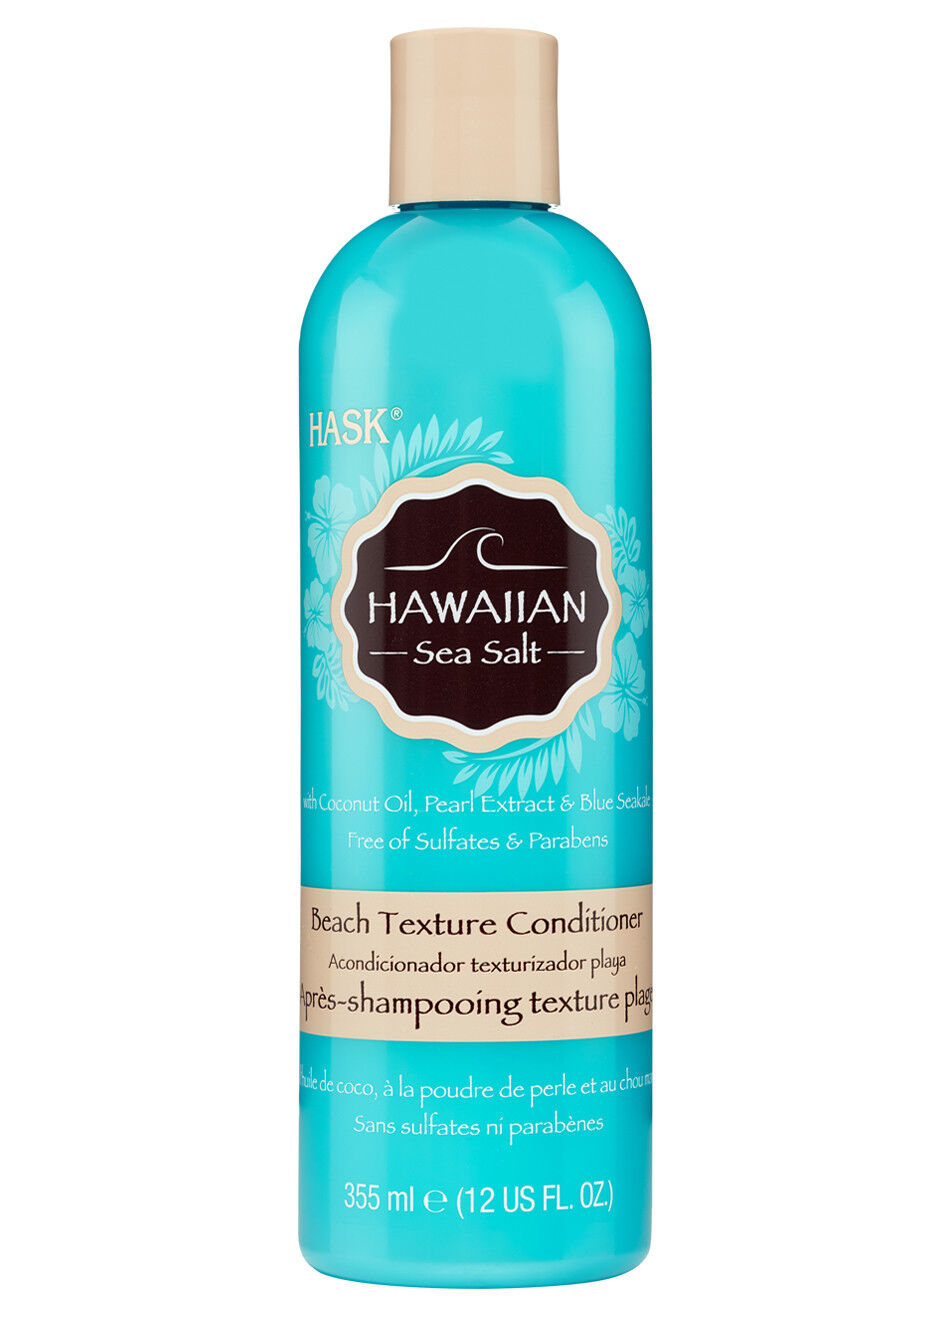 Hask Hawaiian Sea Salt Beach Texture Conditioner with Coconu